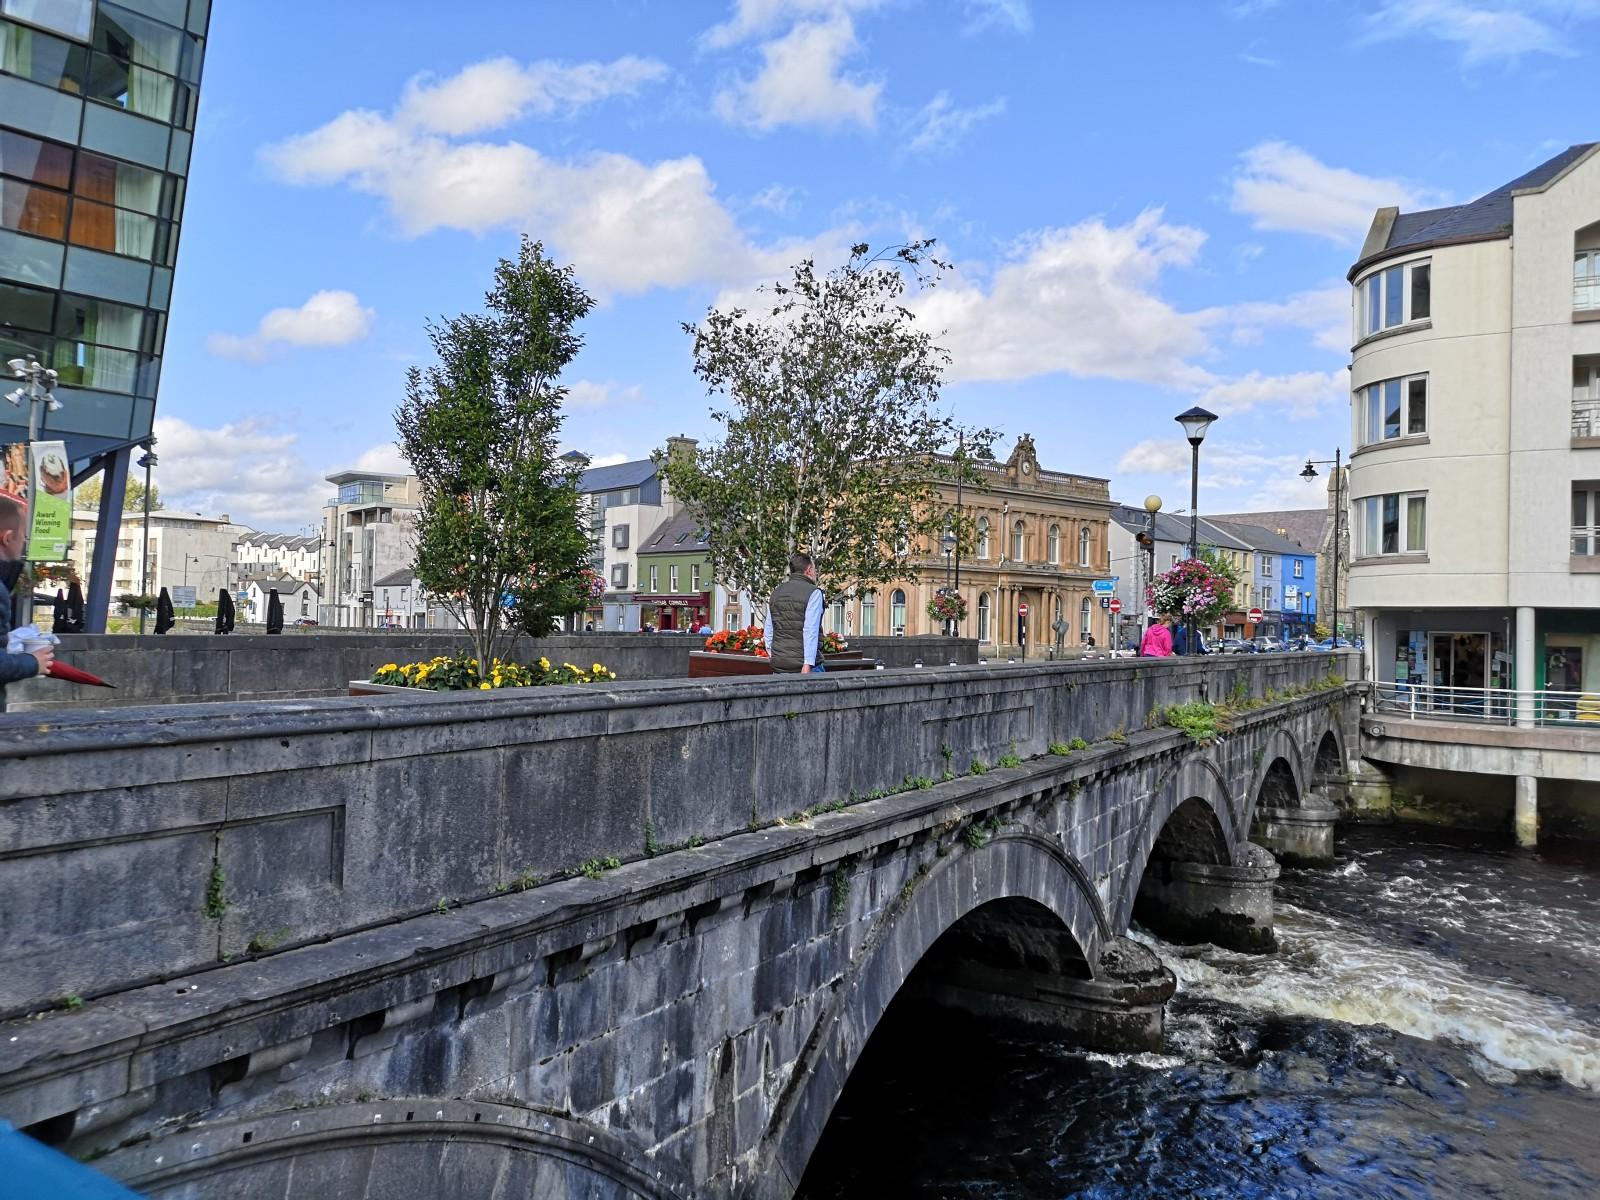 St Patrick's Festival and Sligo Walking Tours